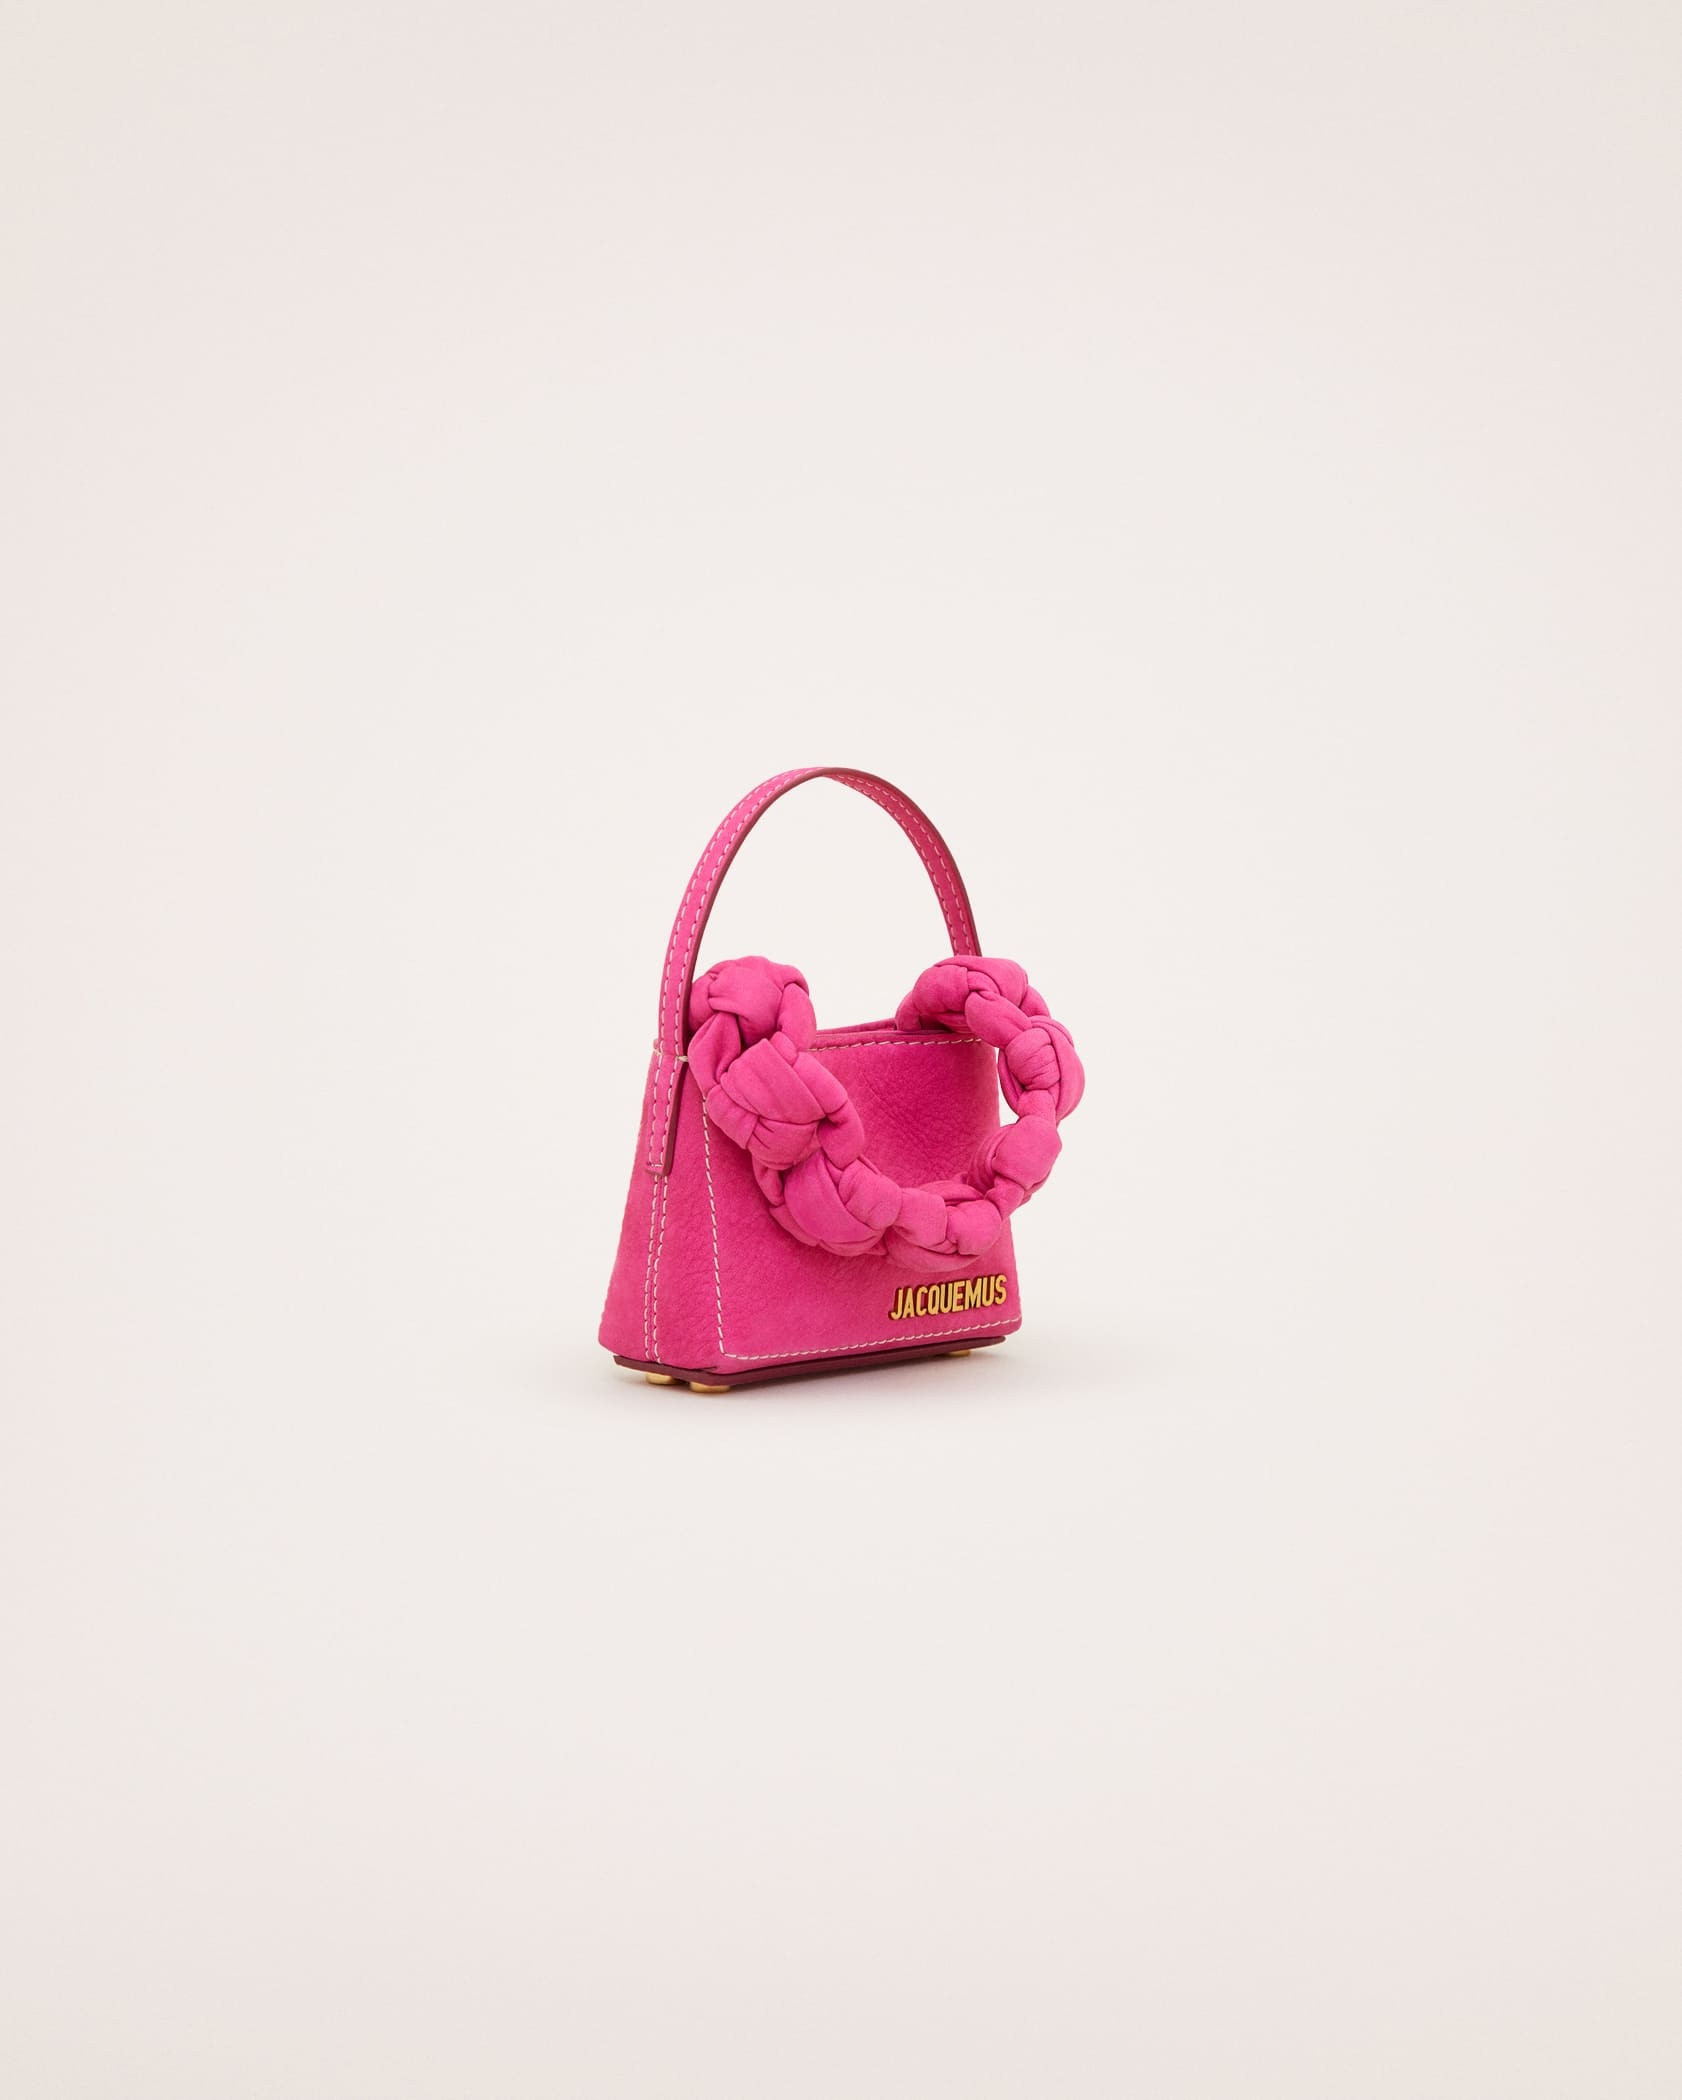 Le petit sac noeud